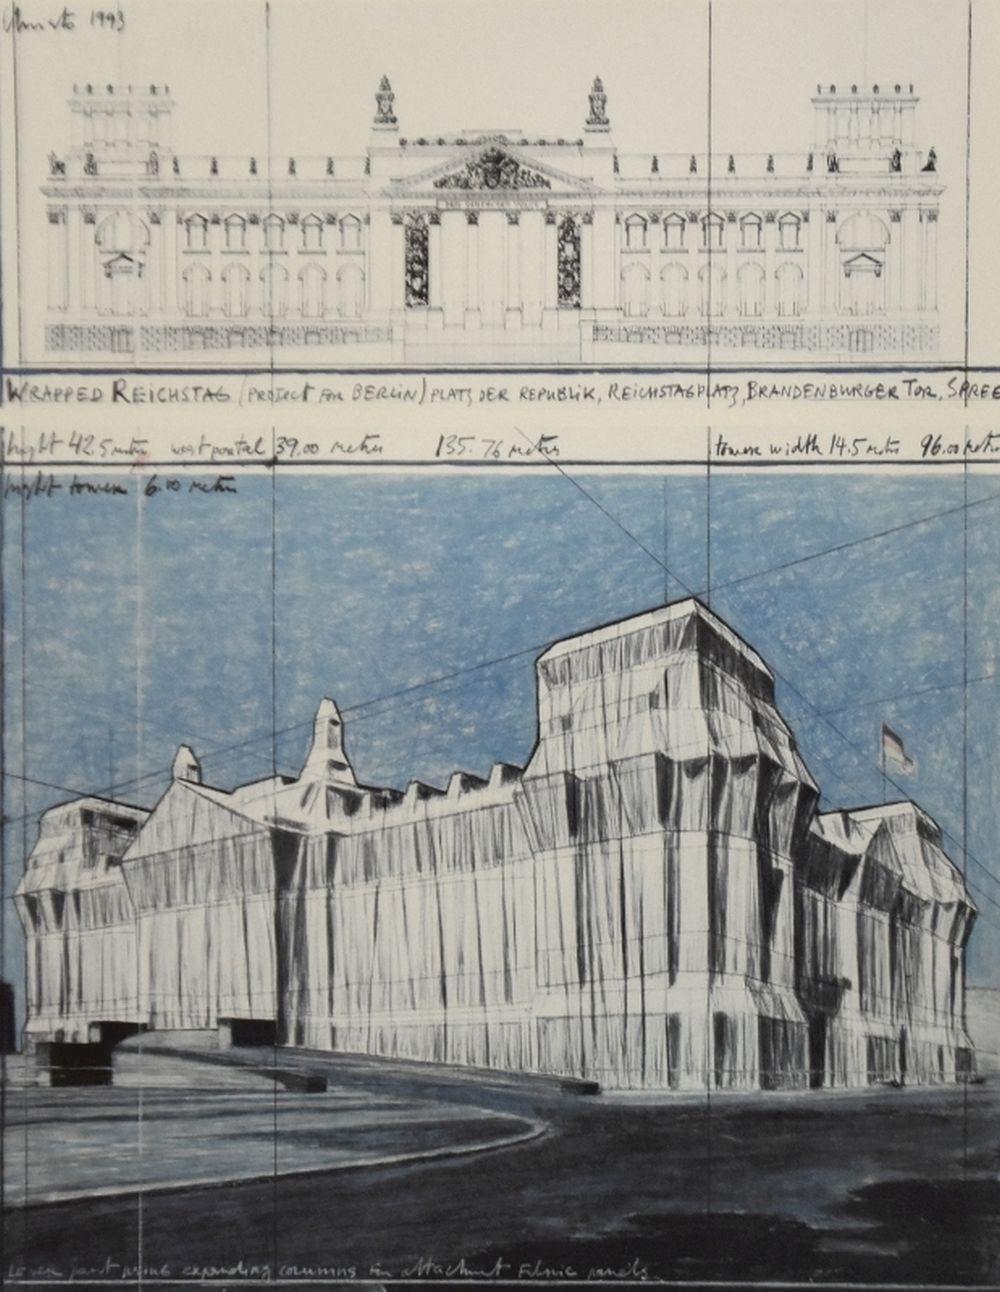 Wrapped Reichstag, signiert - Christo - k-2108CHR21